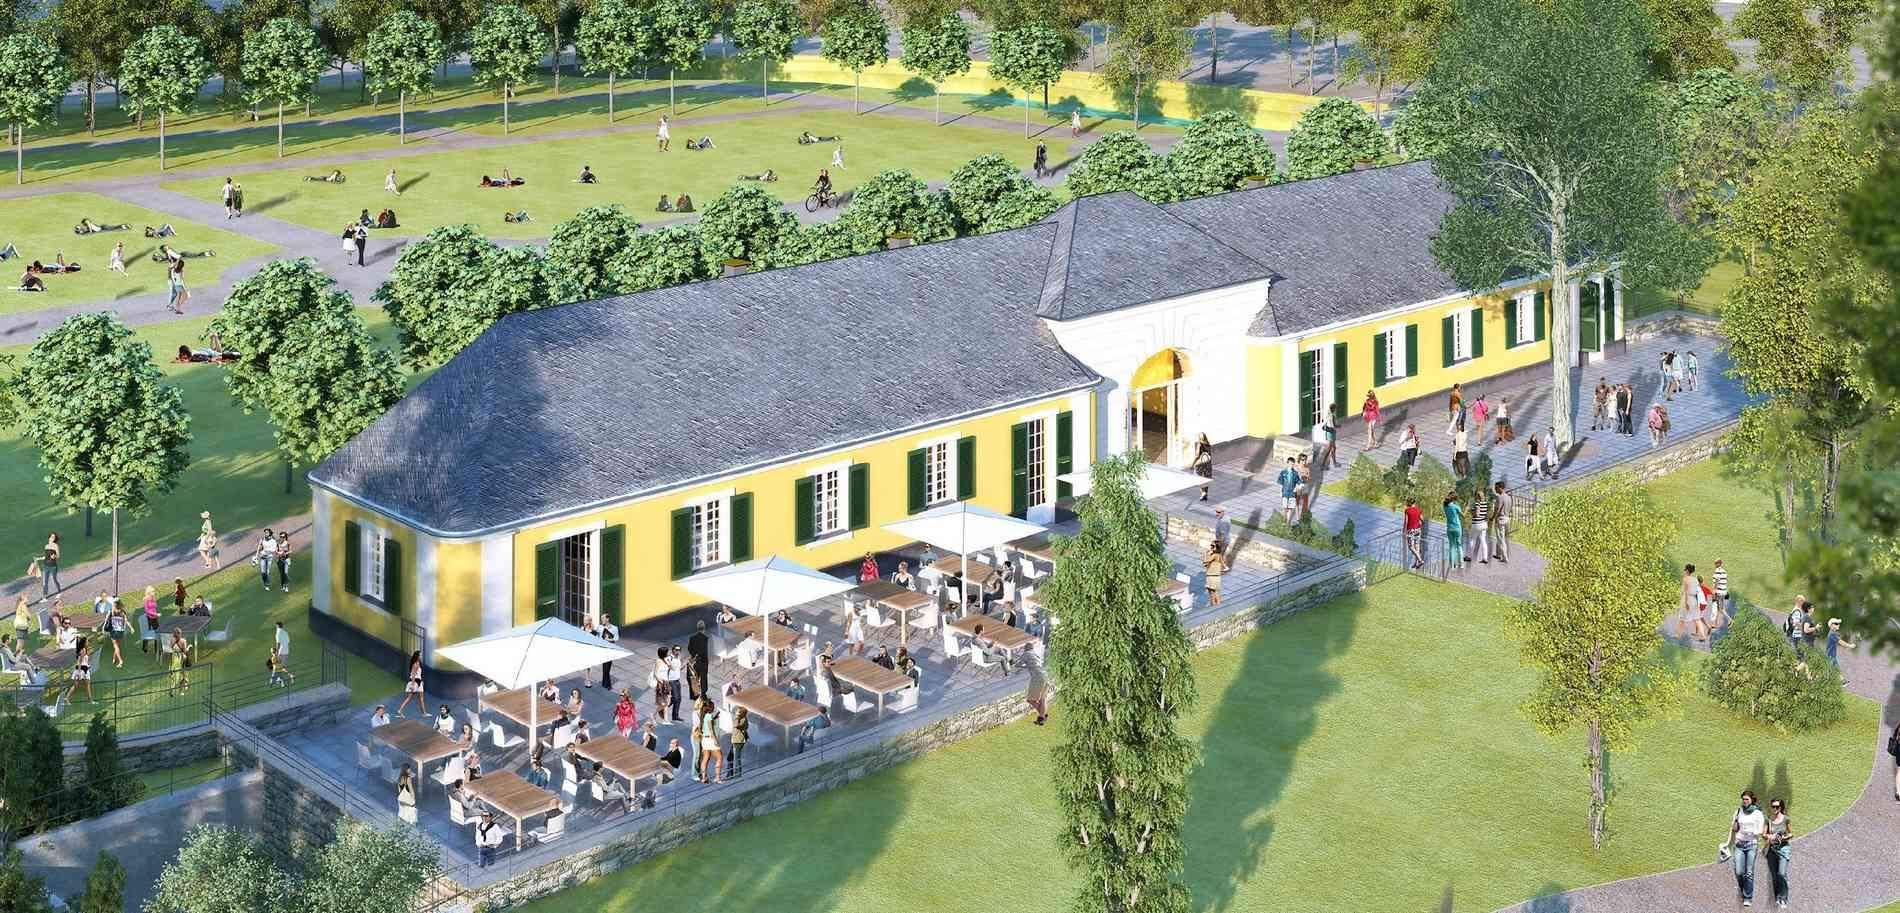 Botanischer Garten Bonn Reizend Remise Am Poppelsdorfer Schloß Wird Umgebaut Neuer Eingang